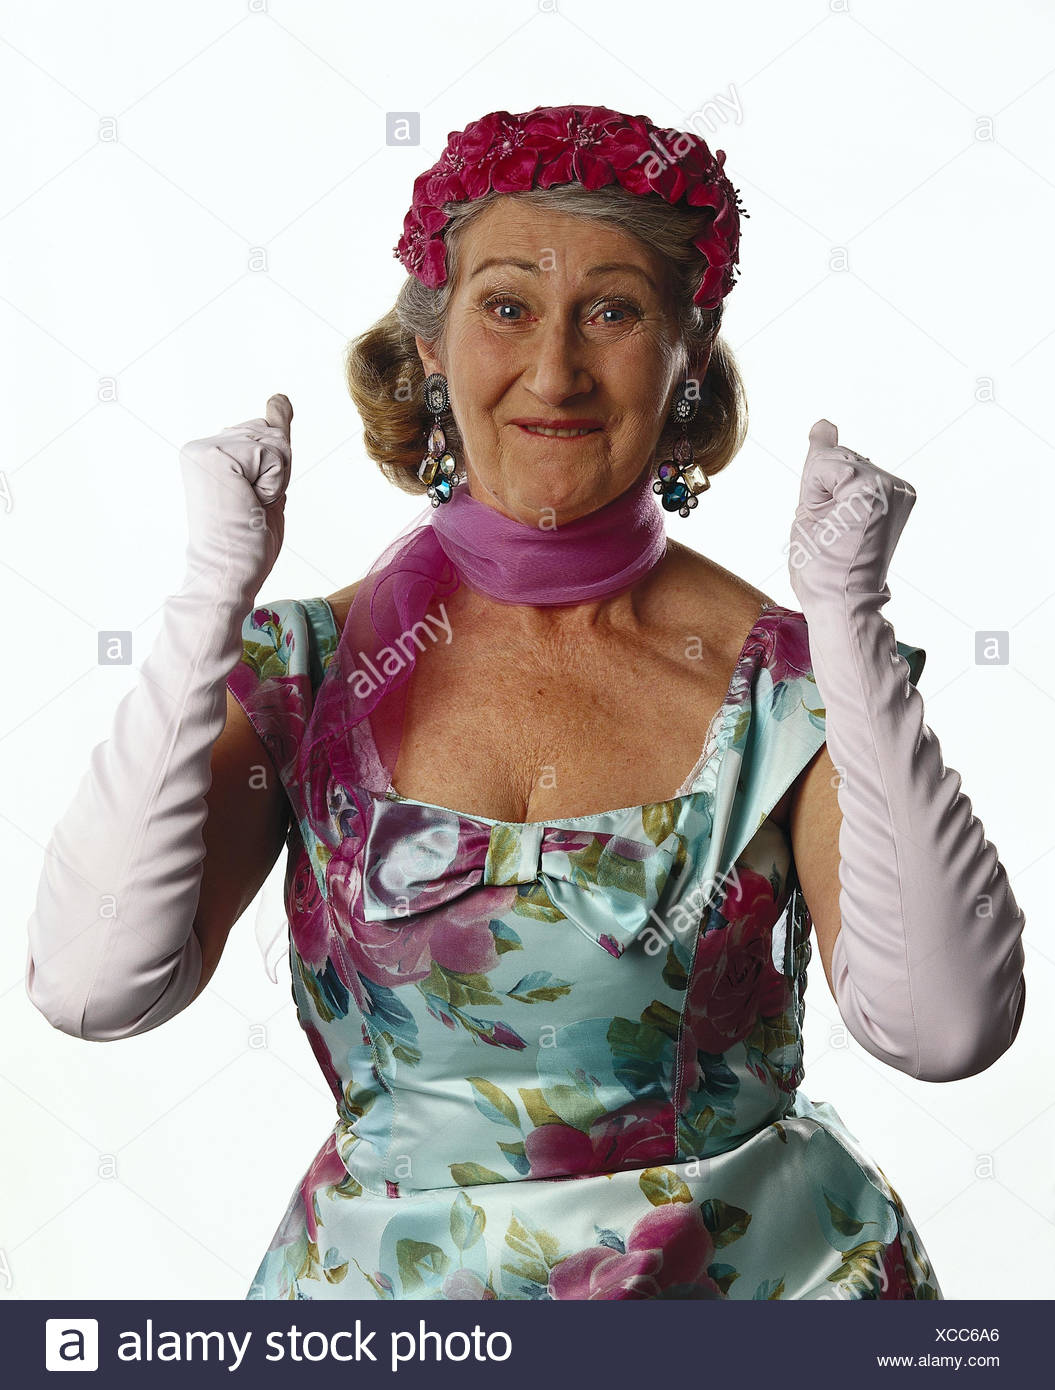 Senior, care, dress, neckerchief, white gloves, gesture, joy, half portrait, mb 125 A6 - Stock Image